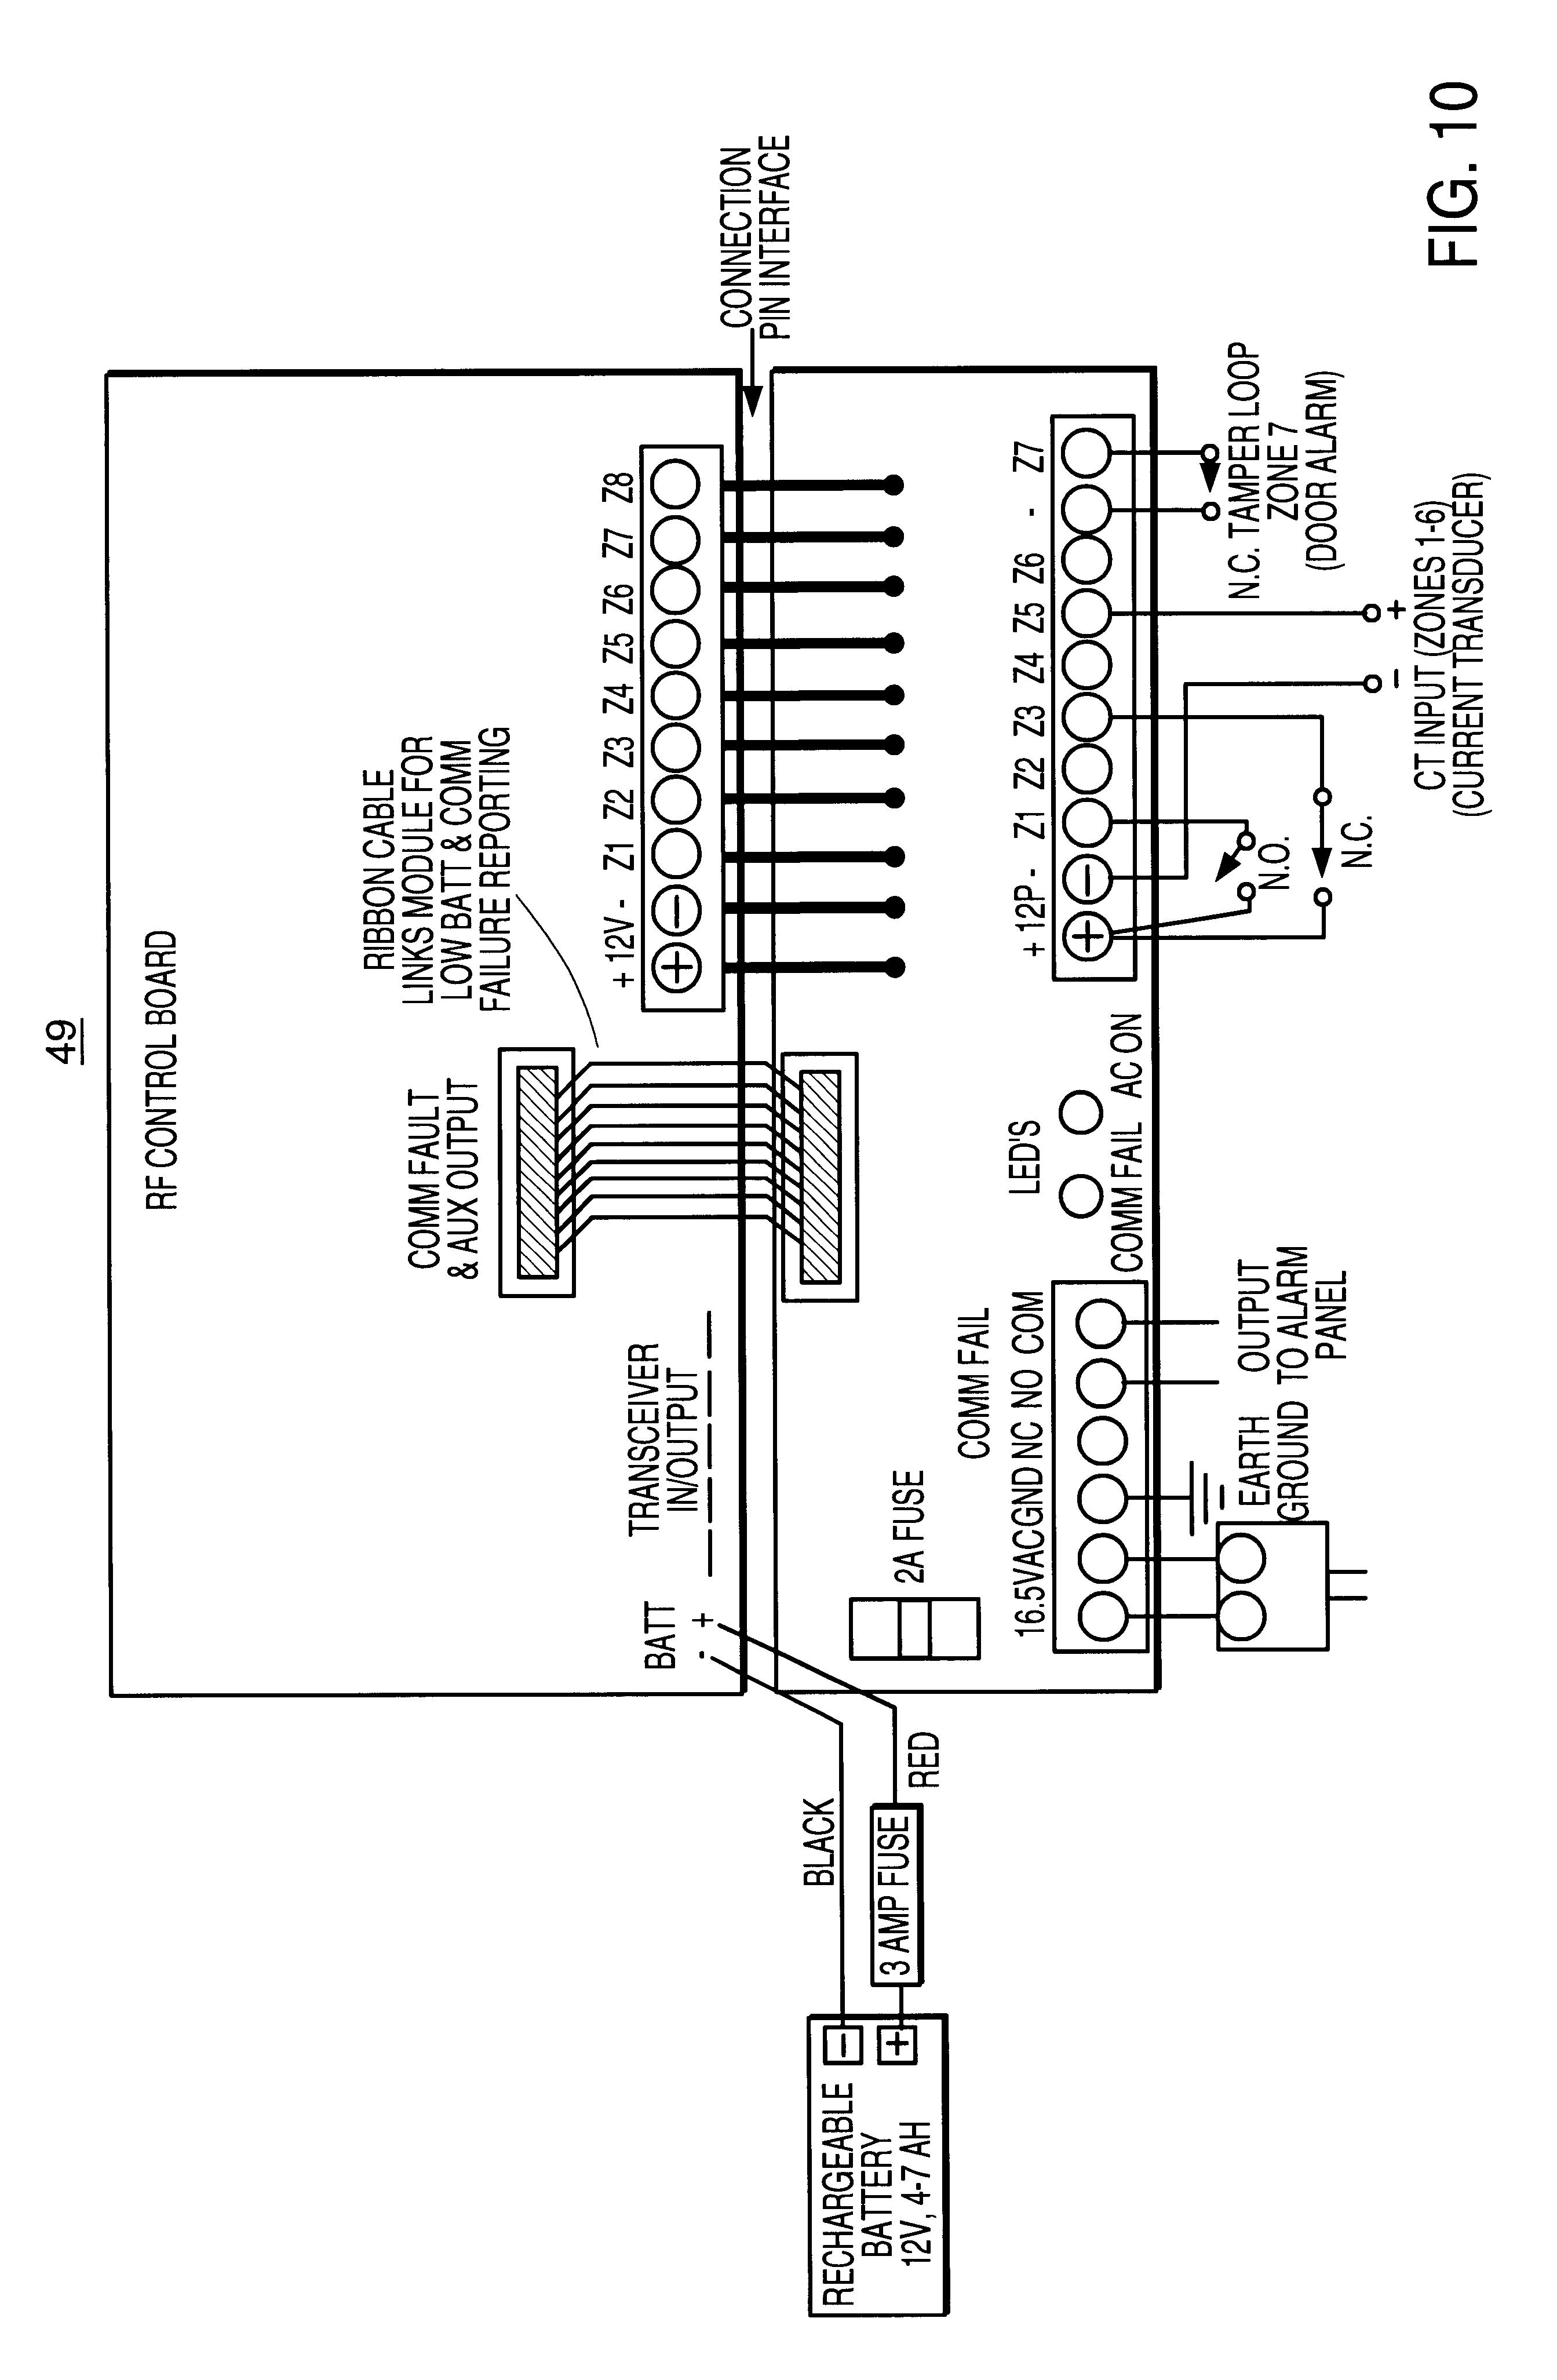 z8 wiring diagram patent us 6 633 823 b2  patent us 6 633 823 b2